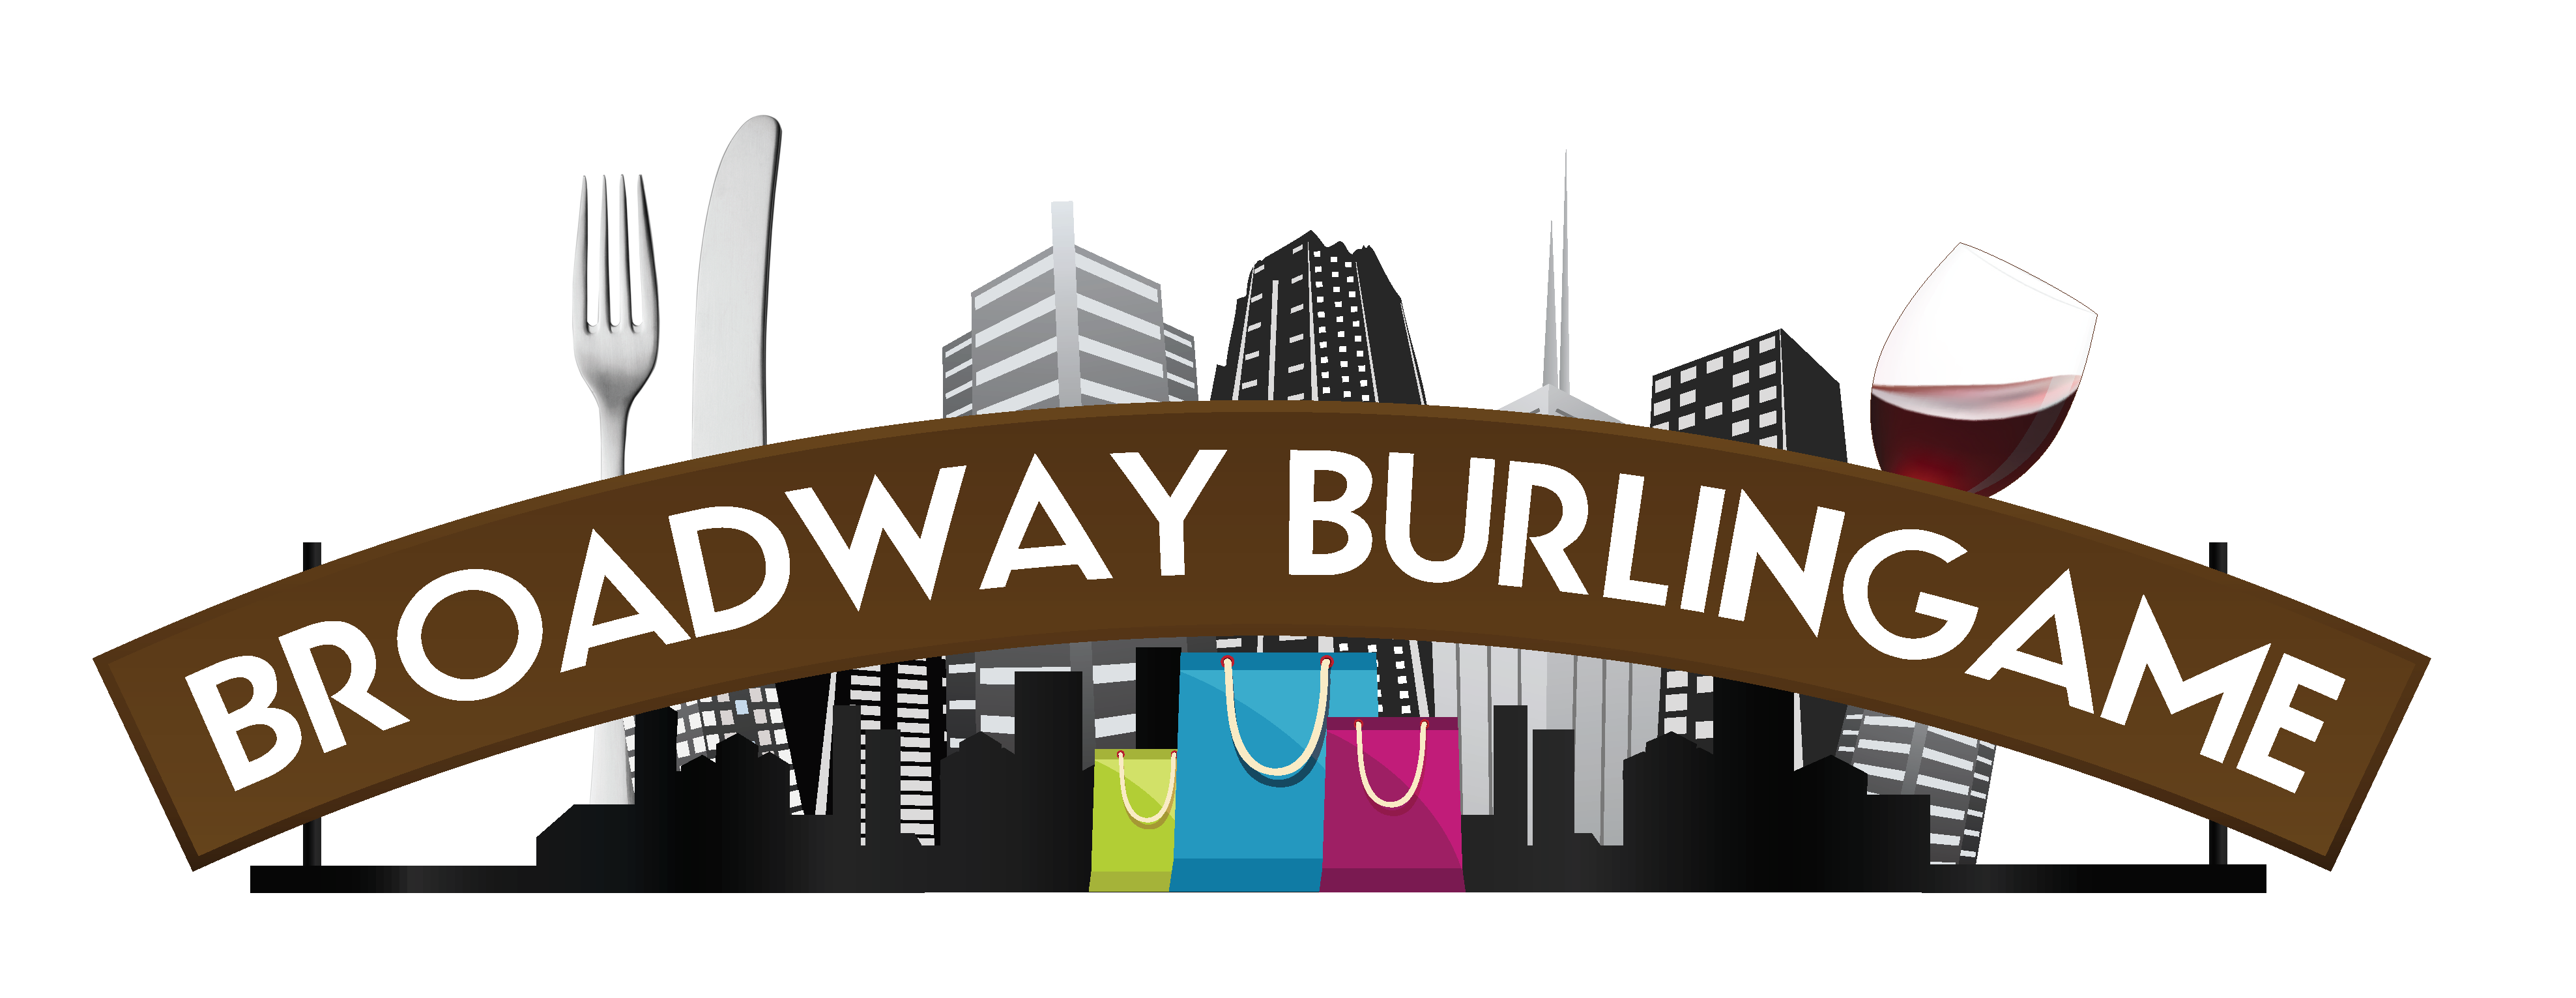 Broadway Avenue Logo